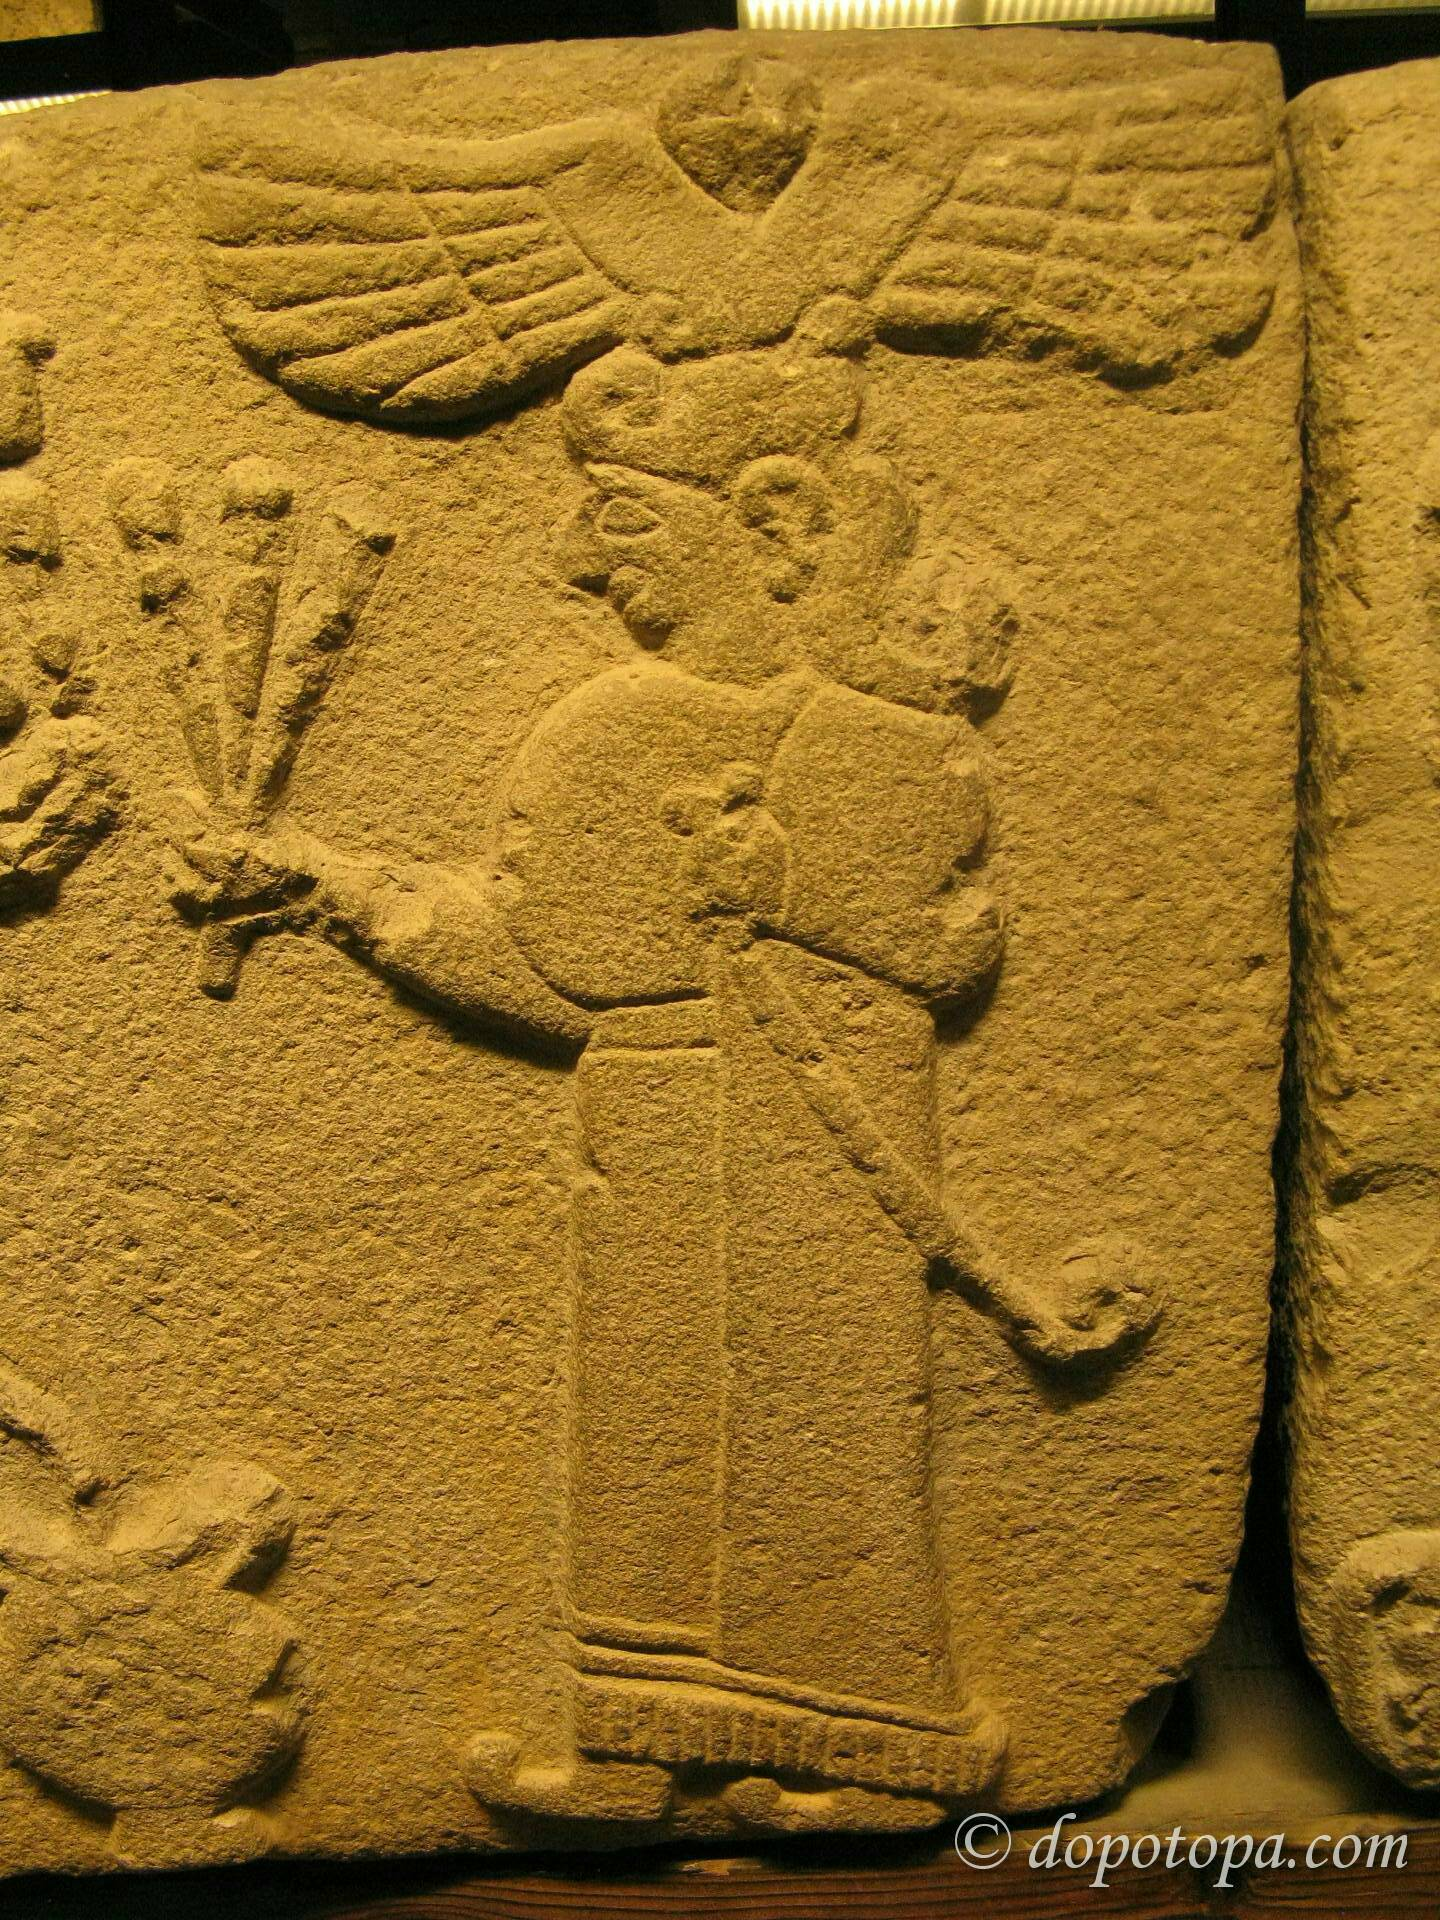 ankara_museum_stone_artefacts_007.JPG